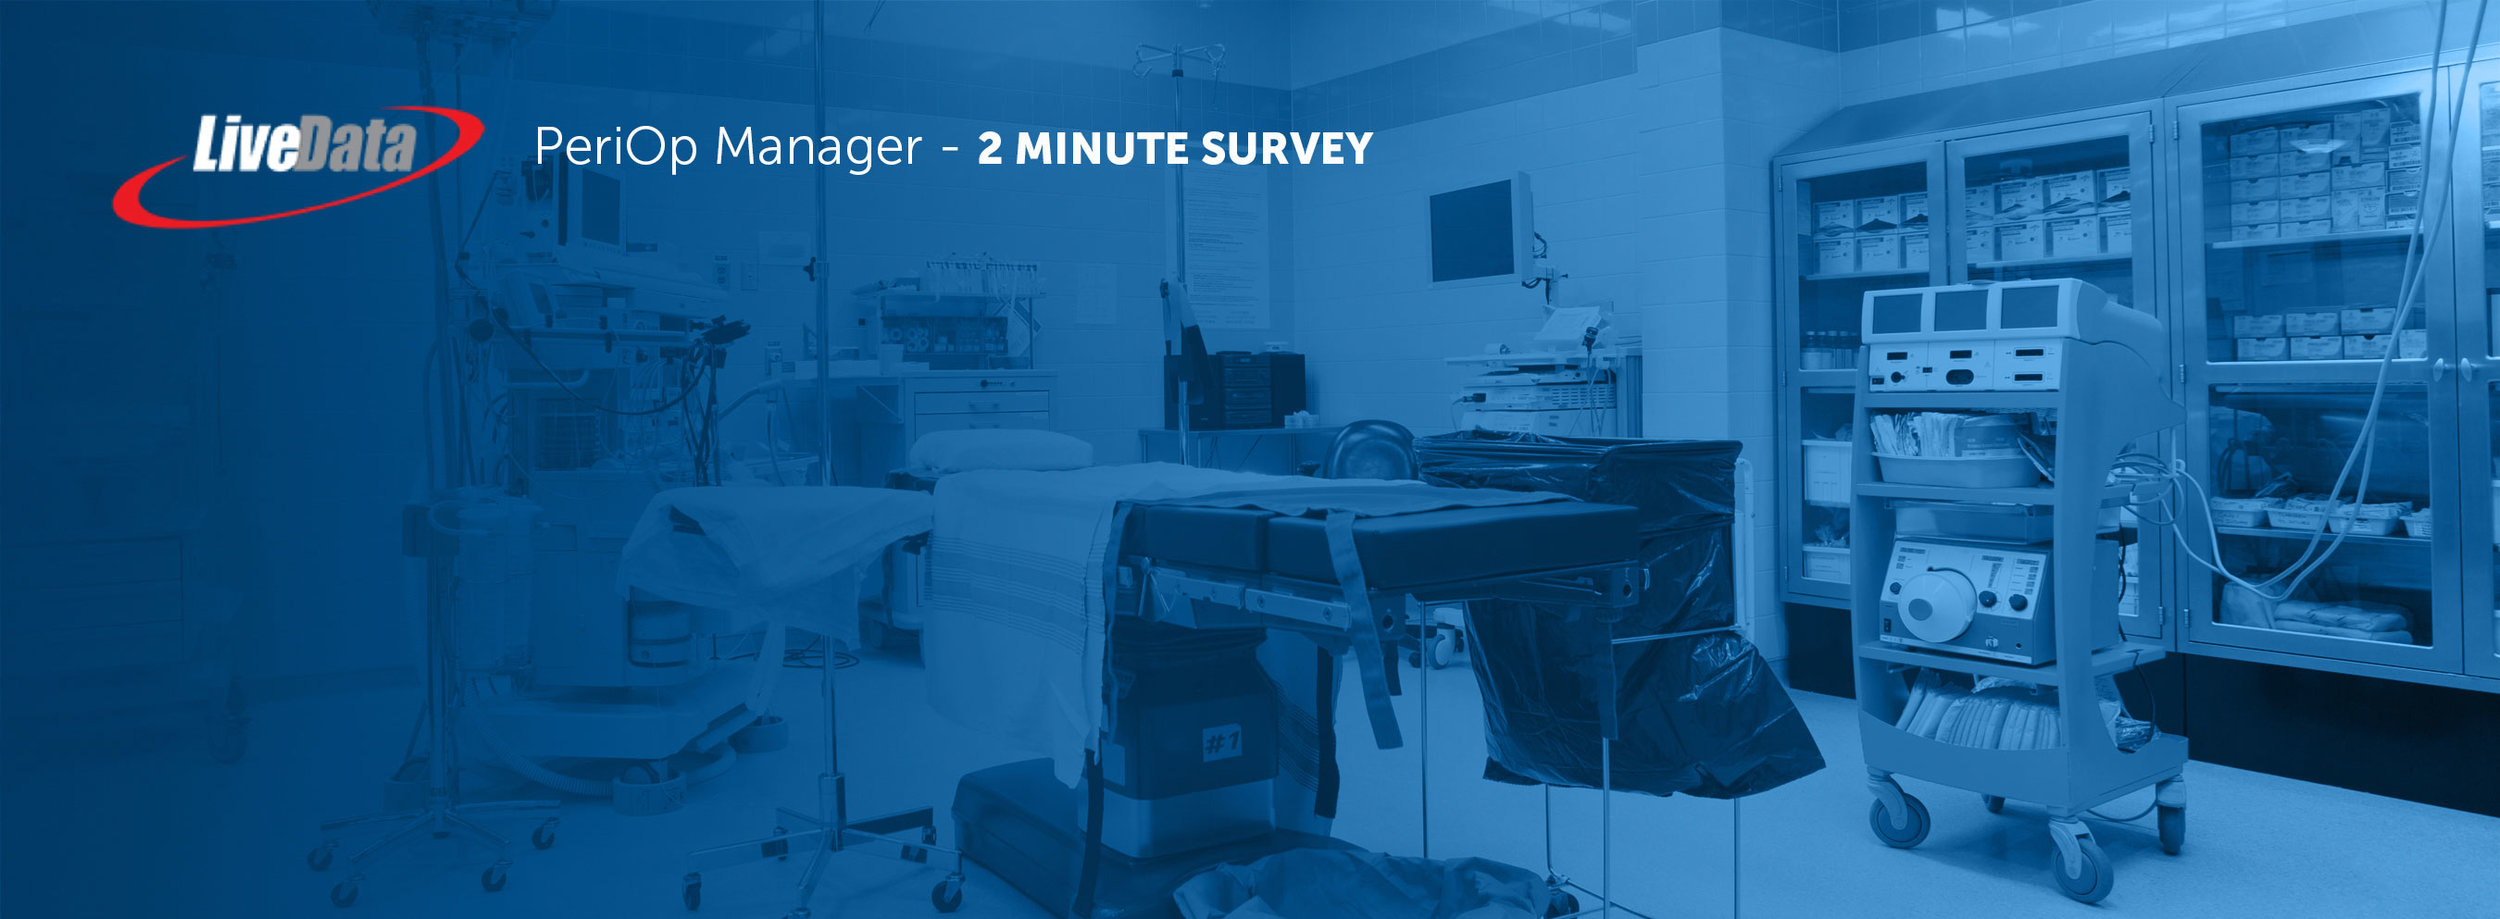 periop_survey.jpg